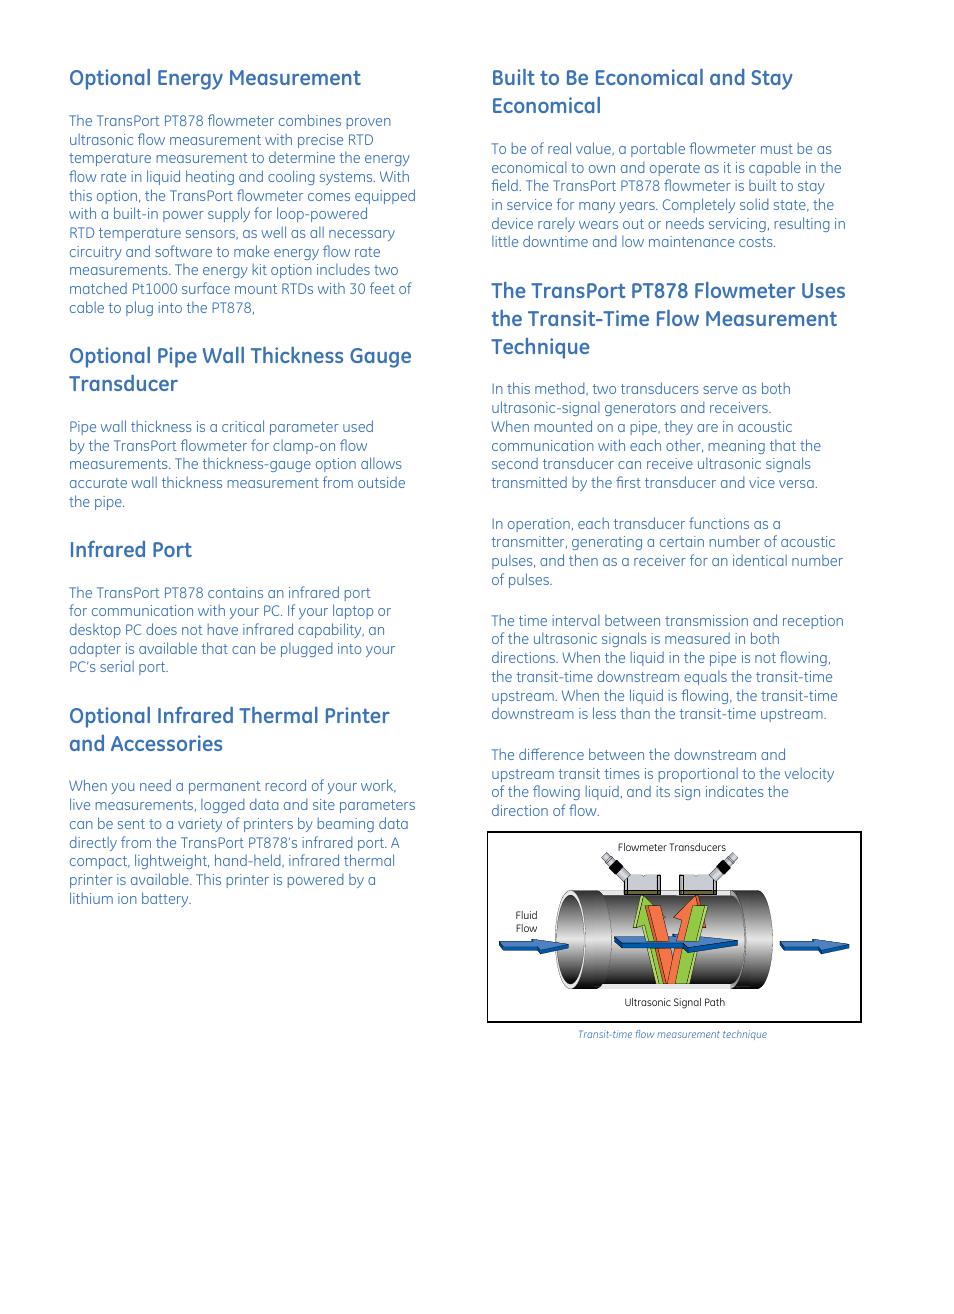 optional energy measurement optional pipe wall thickness gauge rh manualsdir com HP Printer Manuals PDF Hand Crank Manual Printer